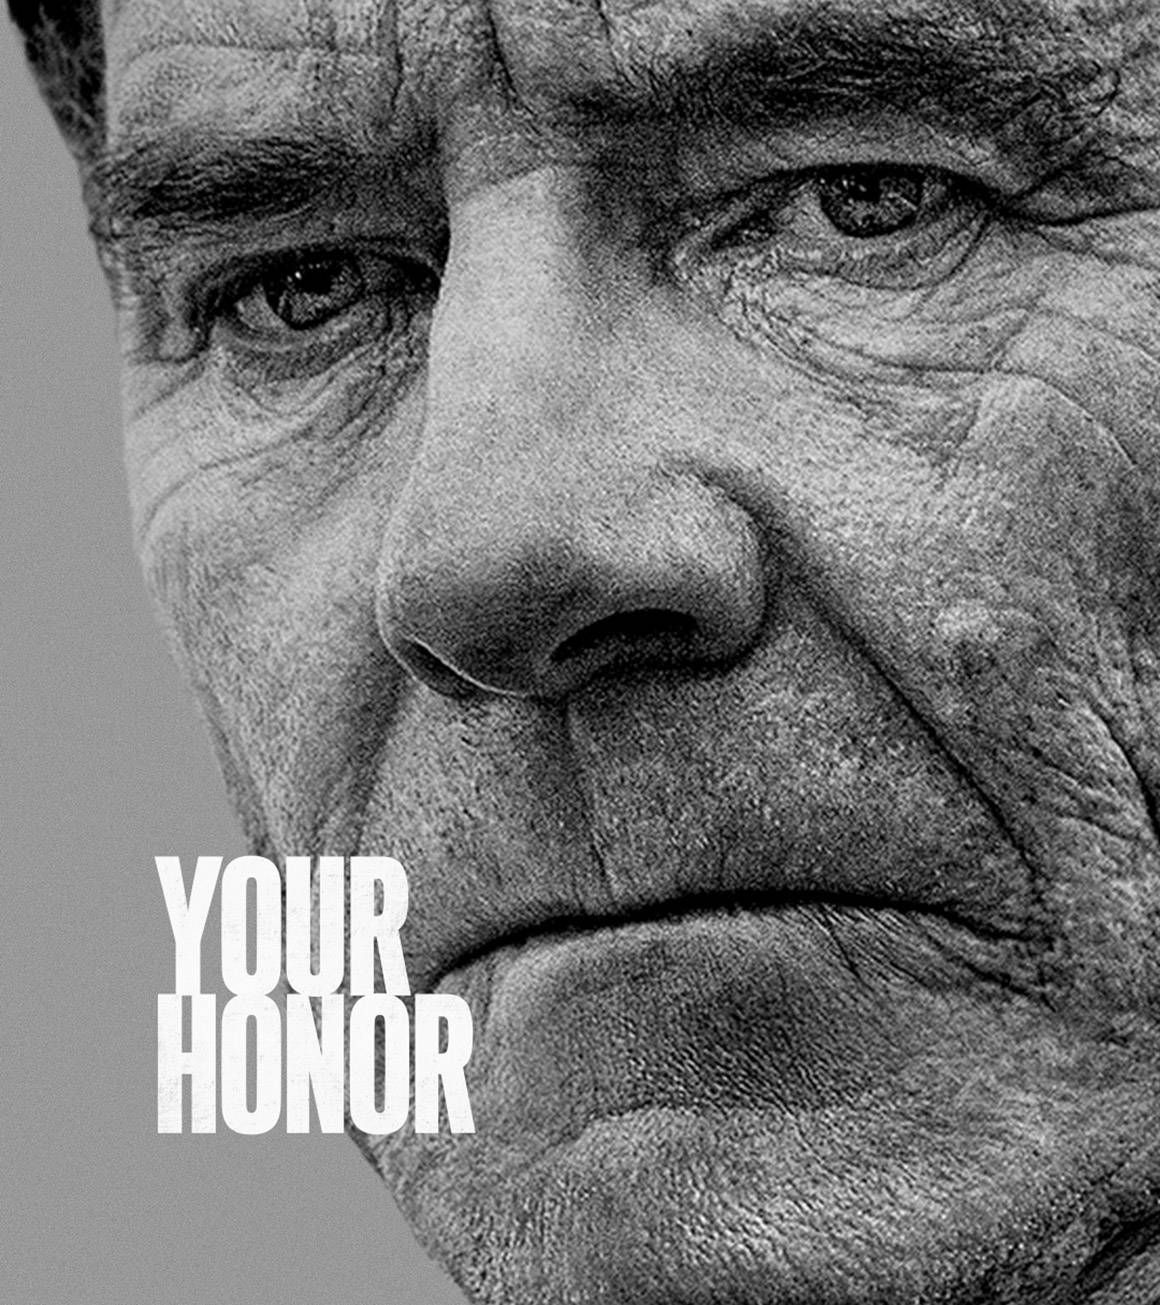 your_honor_sky-news_201204_8_9_rdax_70